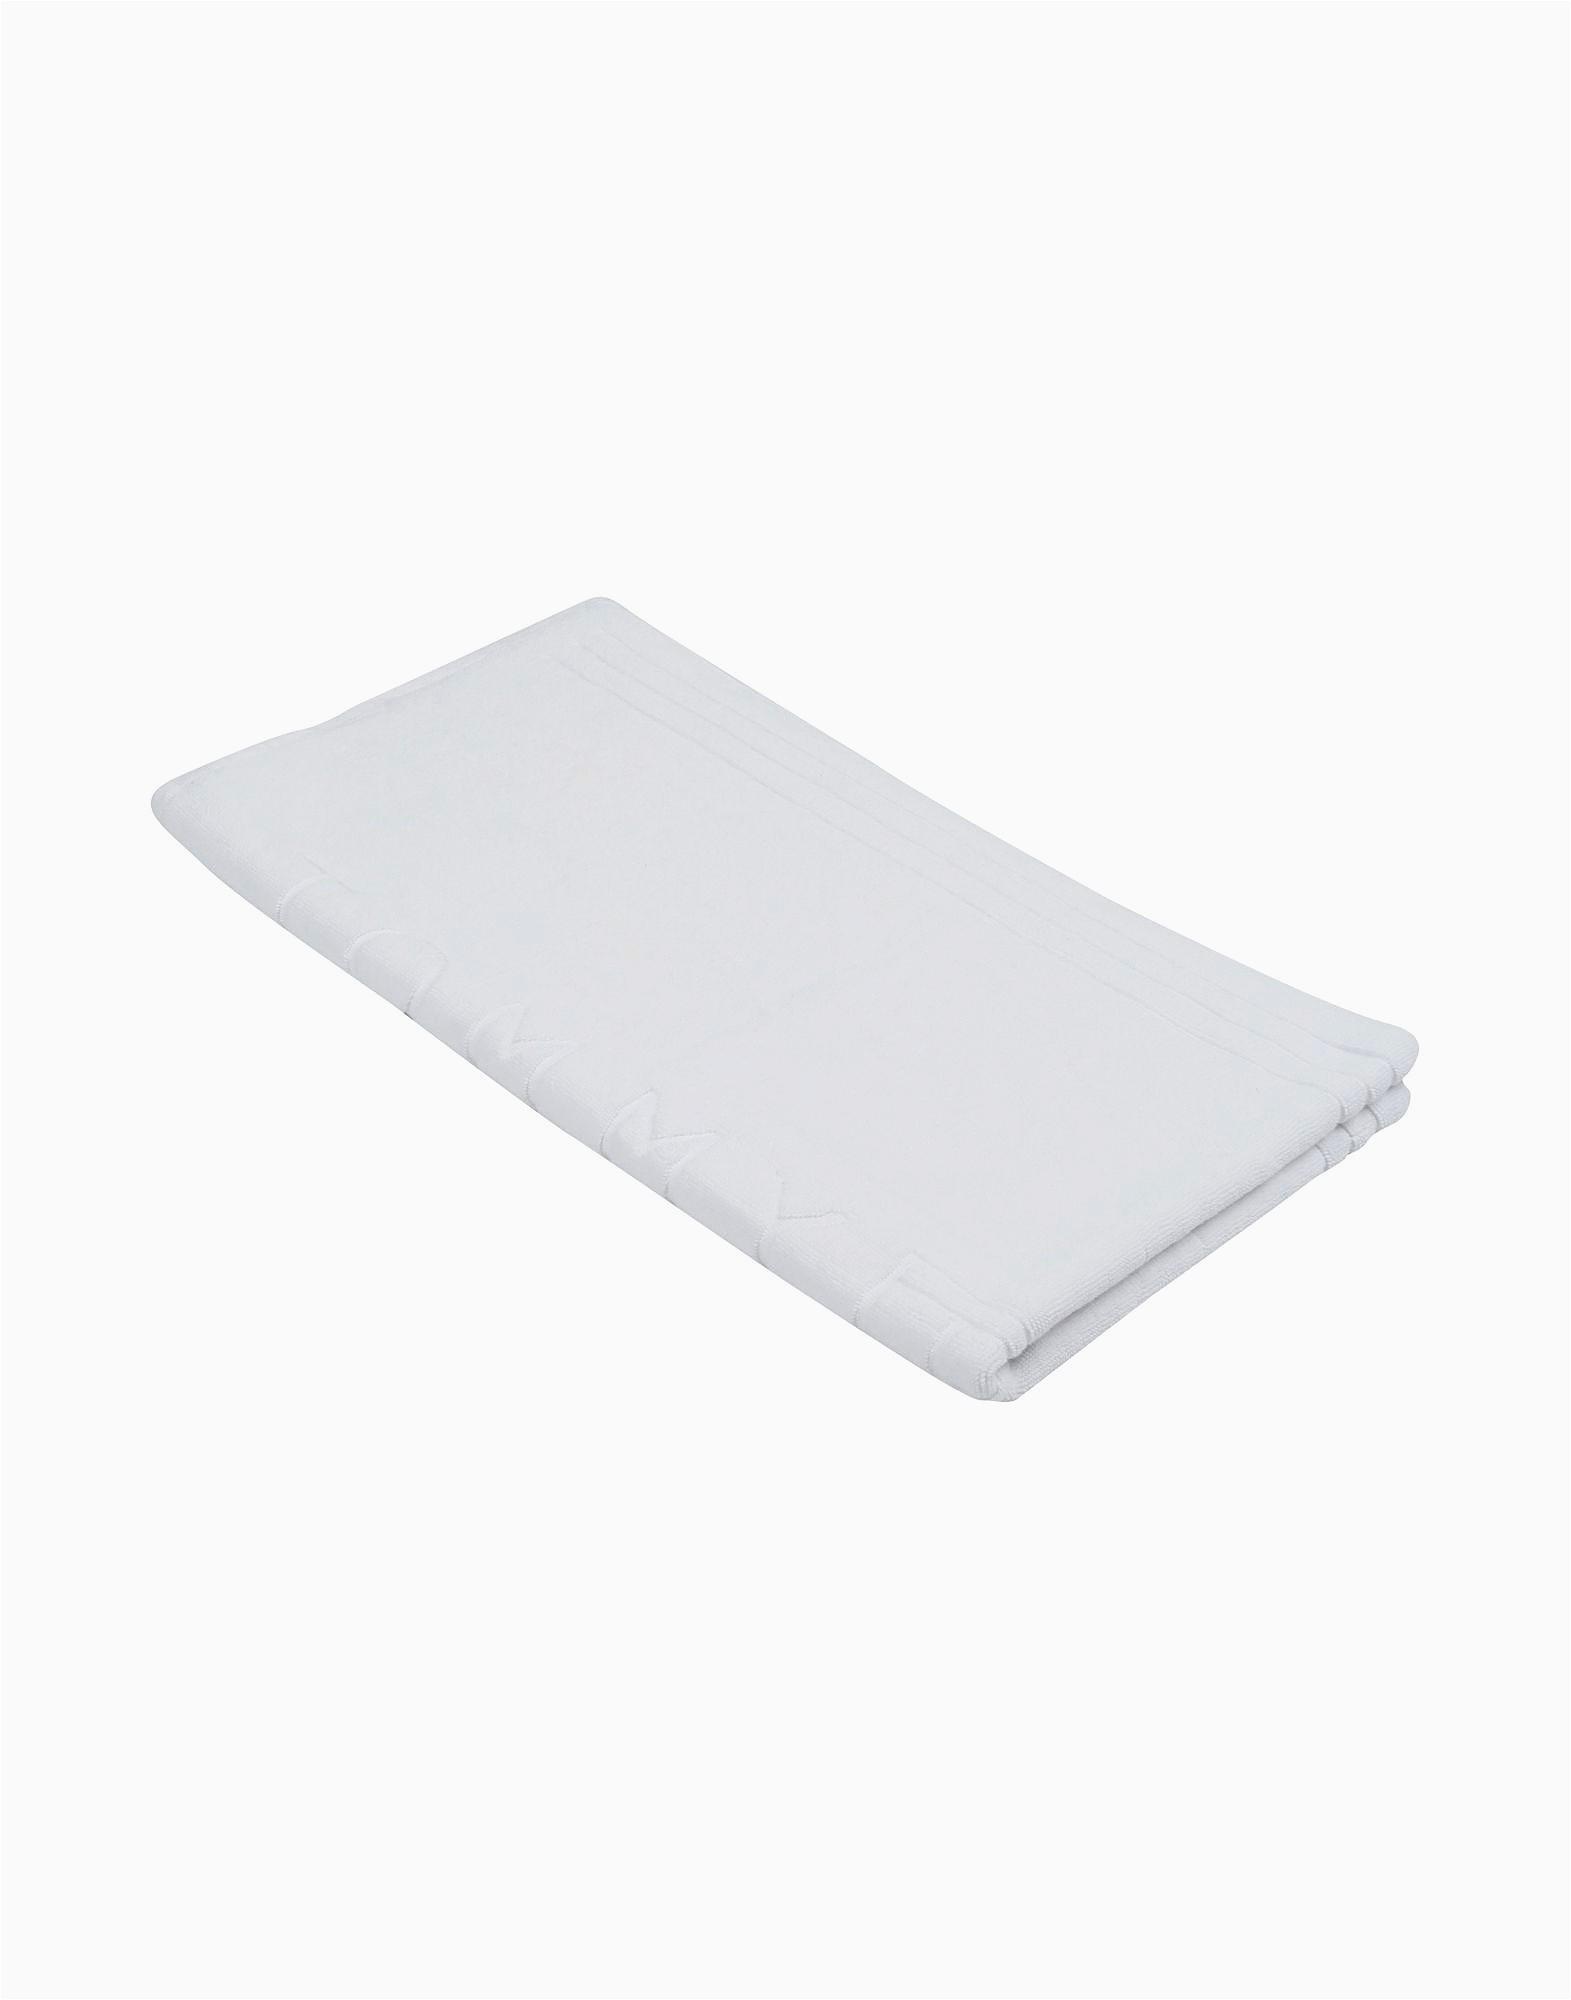 Tommy Hilfiger White Bath Rug tommy Hilfiger Mat Legend Bathroom Textiles Design Art